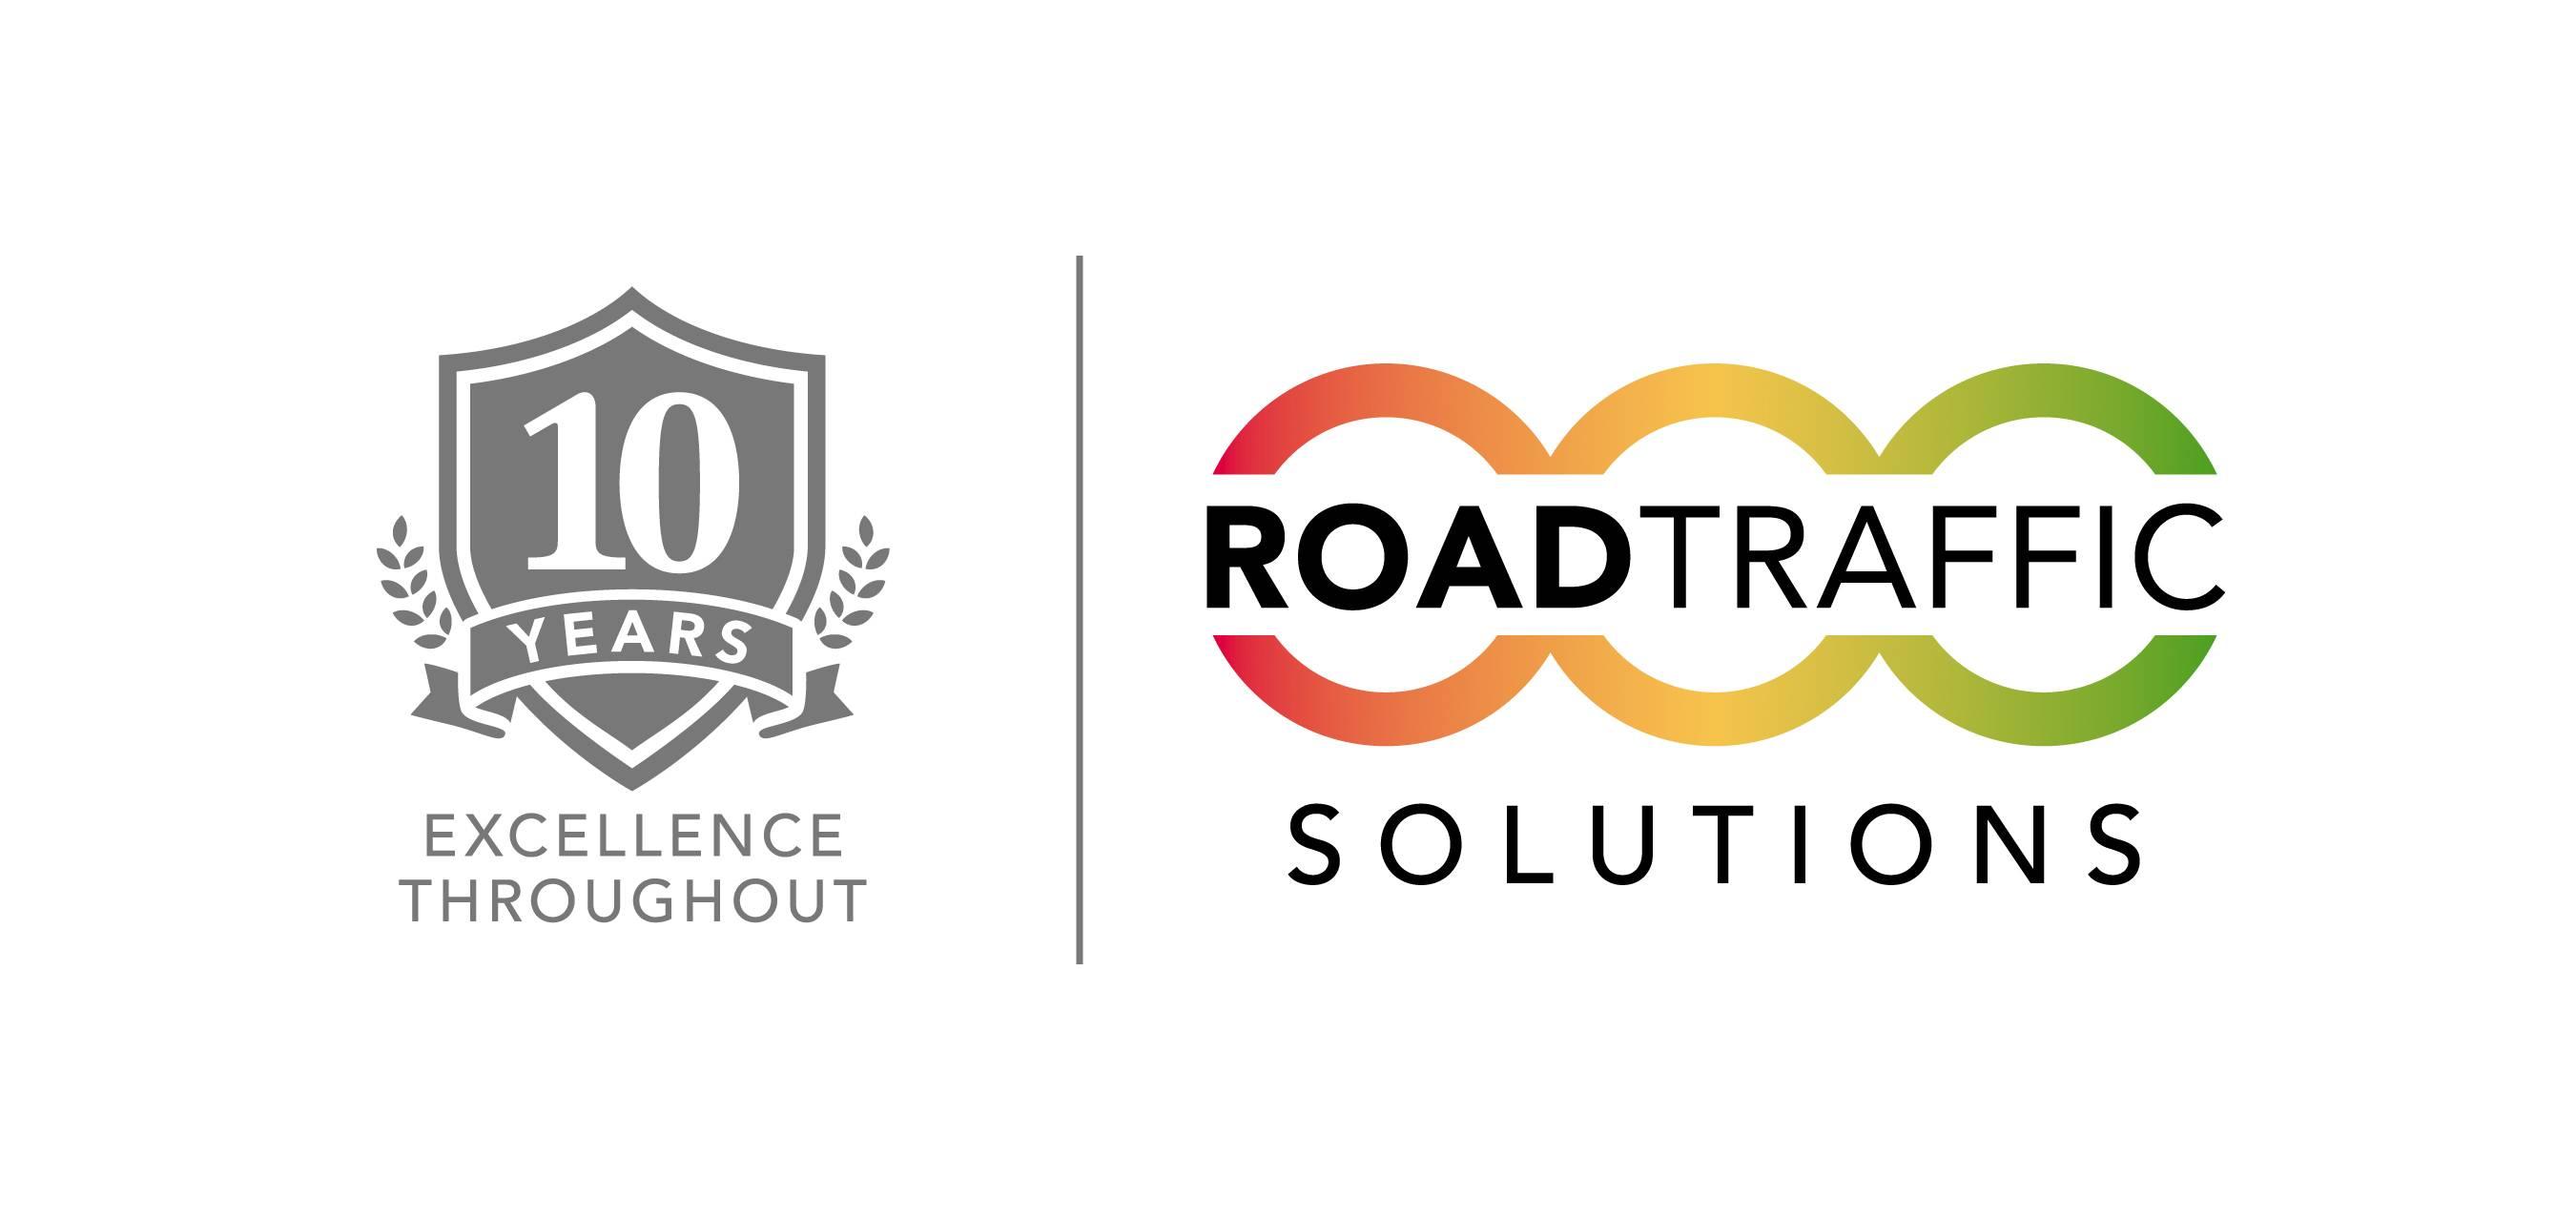 Road Traffic Solutions logo